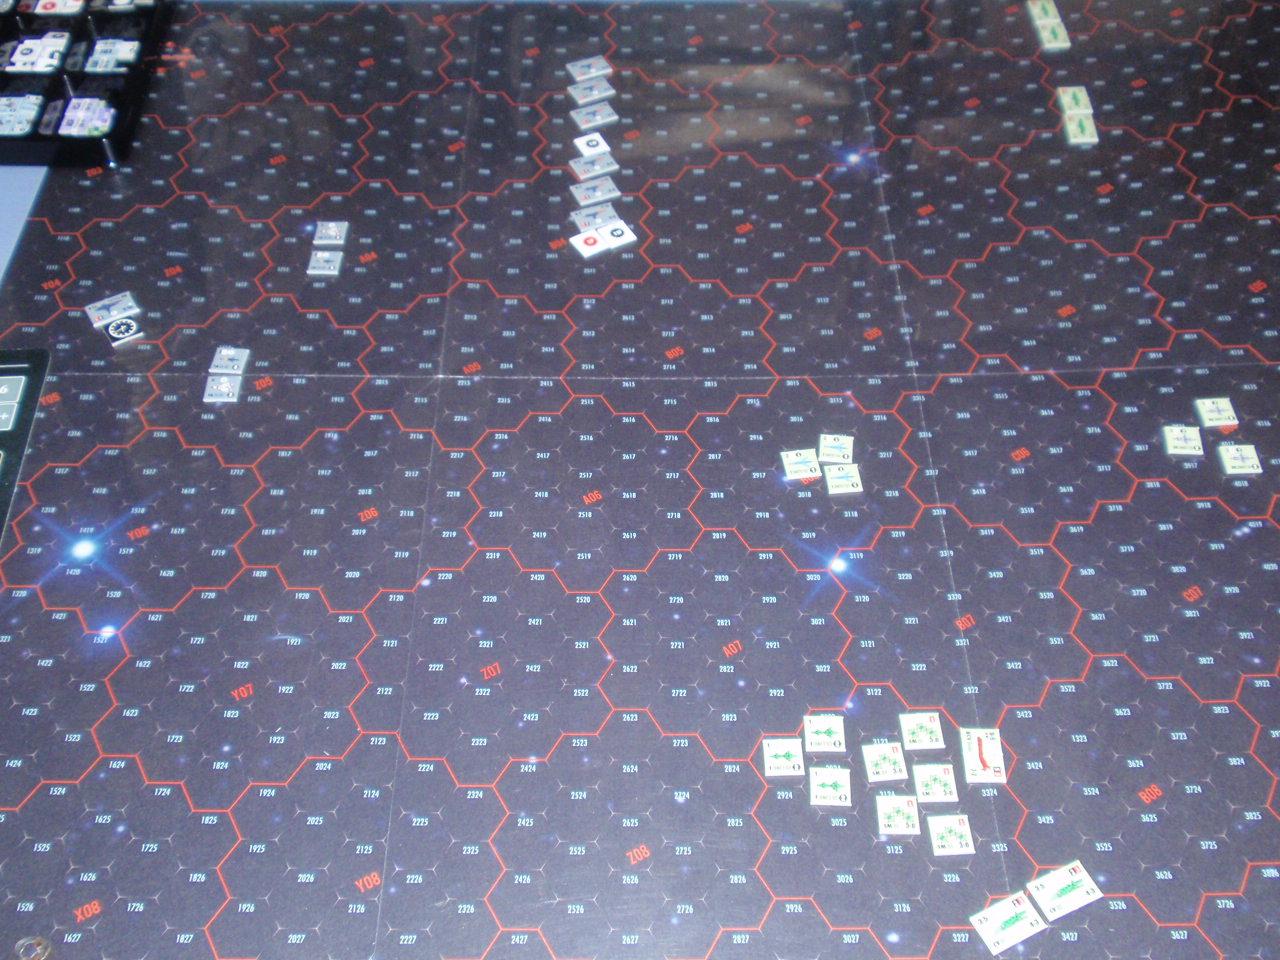 Bonsai Games「アイアン・デブリ・システム」よりシナリオ「マザータウン沖海戦」を再度ソロプレイ①_b0162202_19354731.jpg